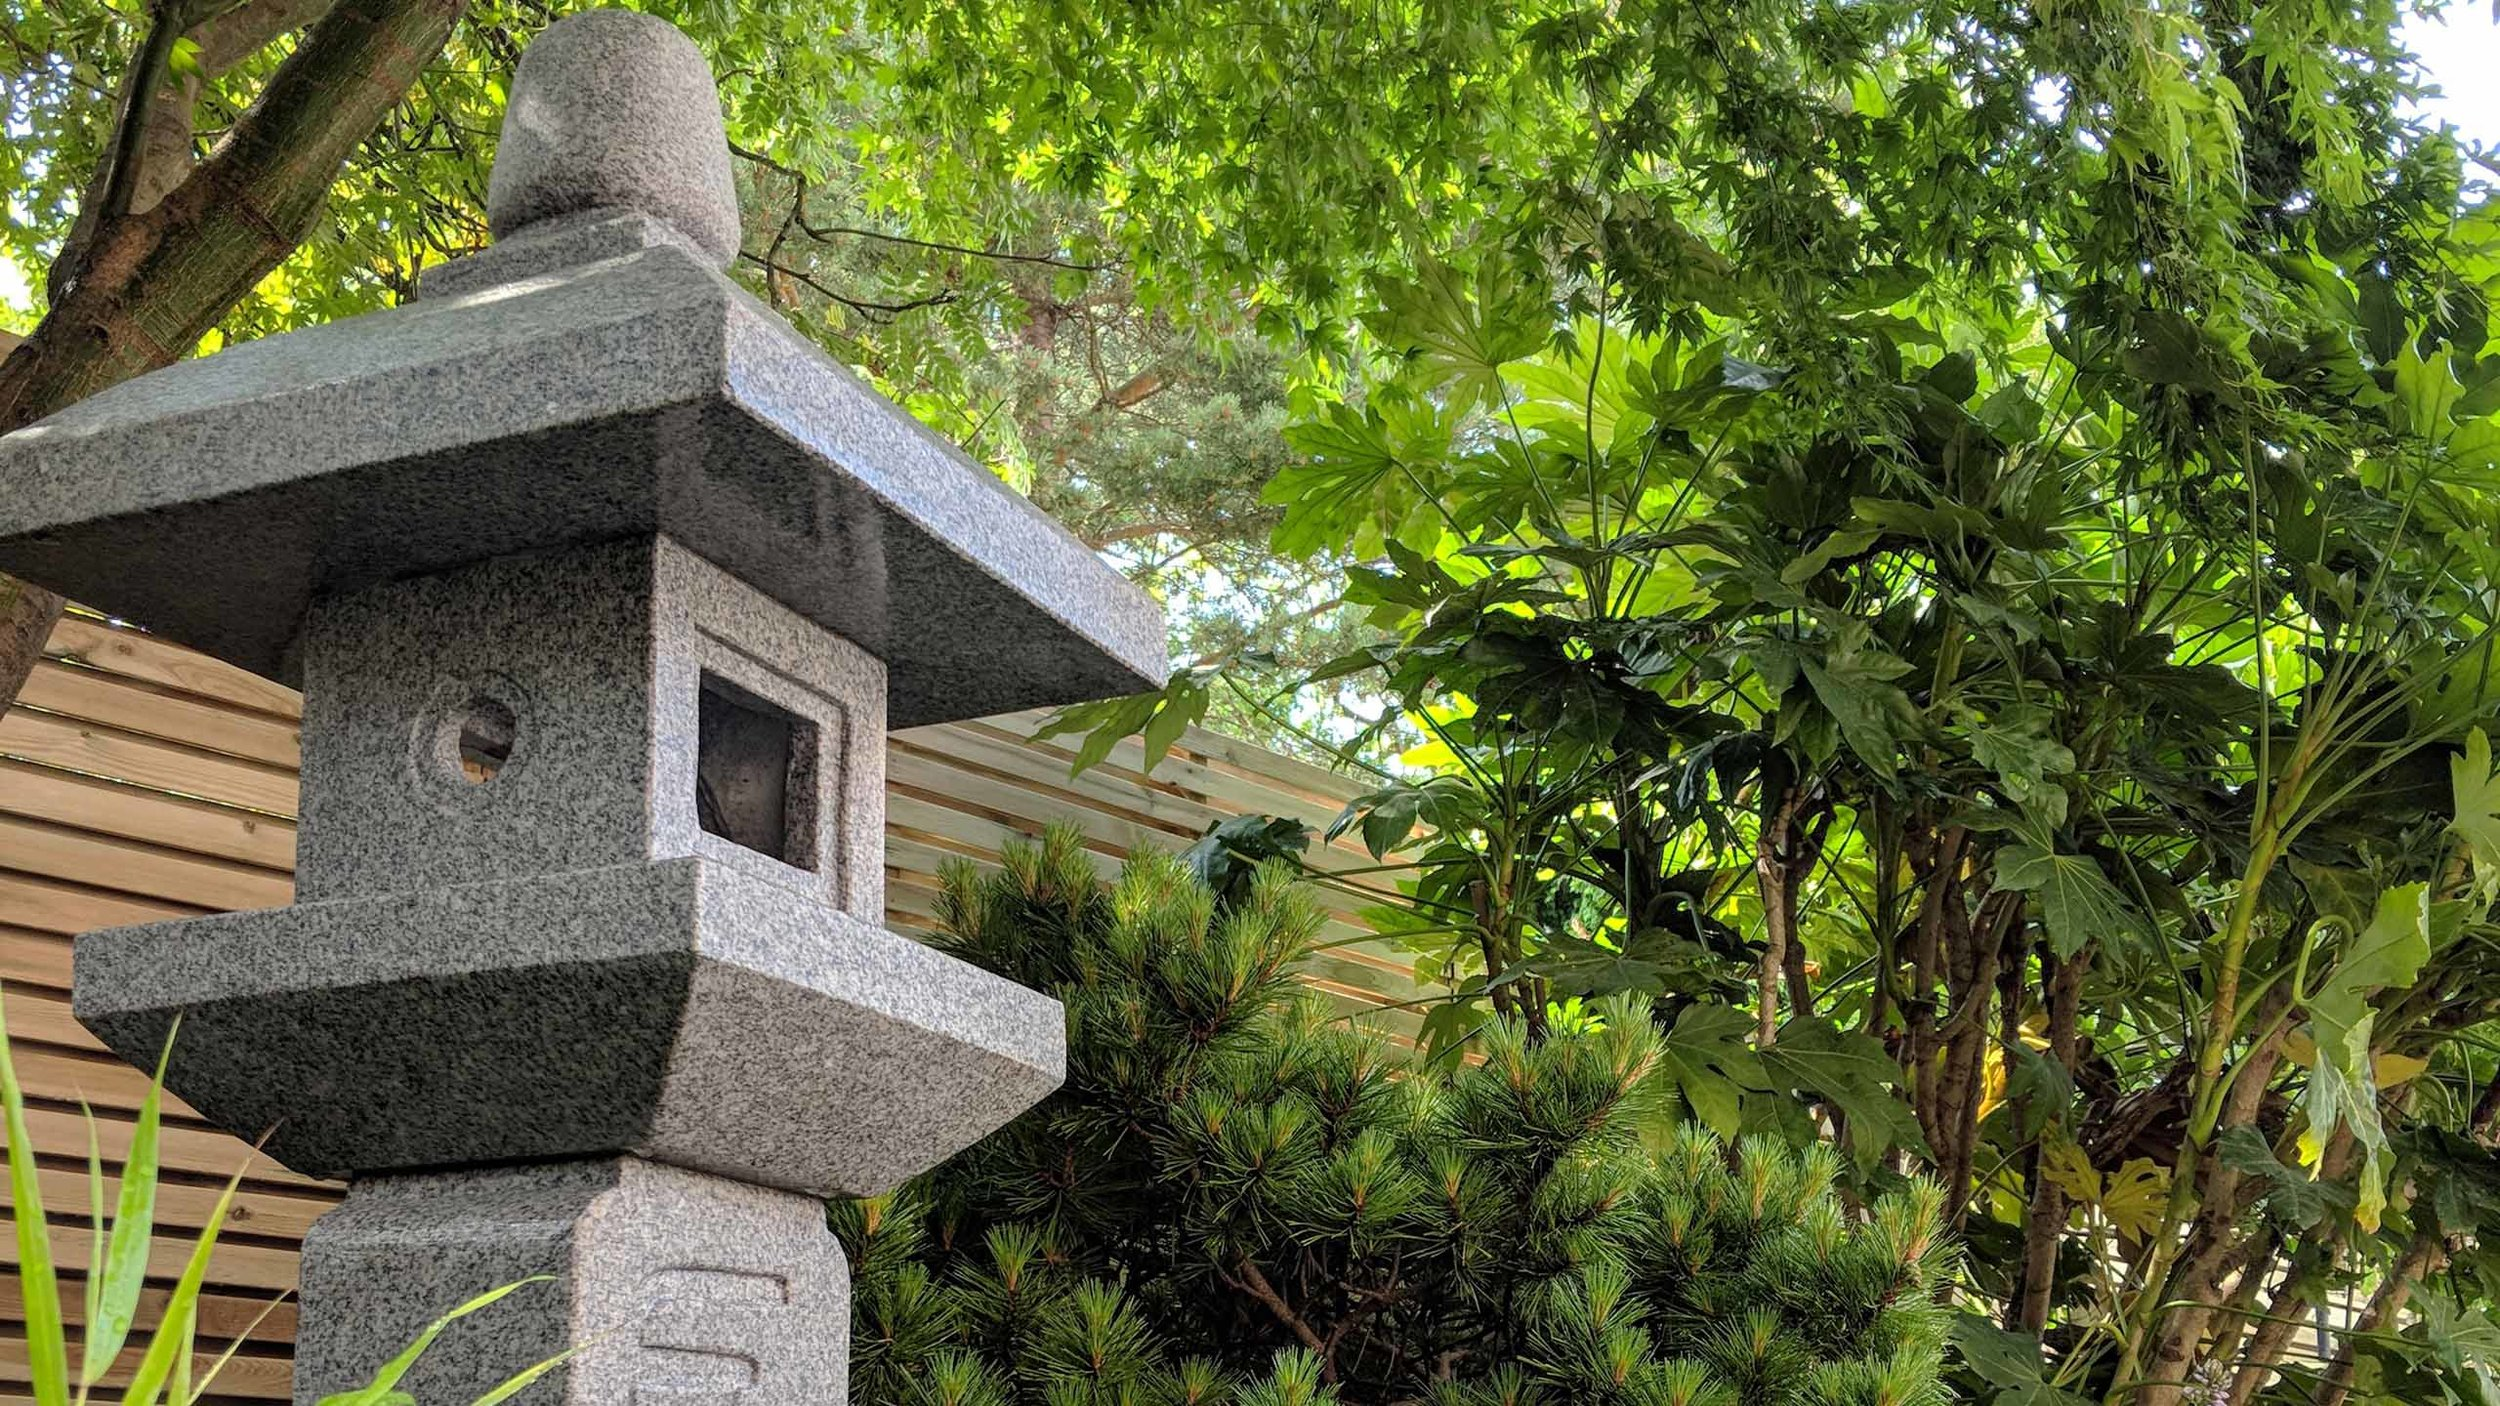 Cheshire Garden Design: Japanese garden with Oribe (Lantern): Screening and Acer palmatum 'Bloodgood'